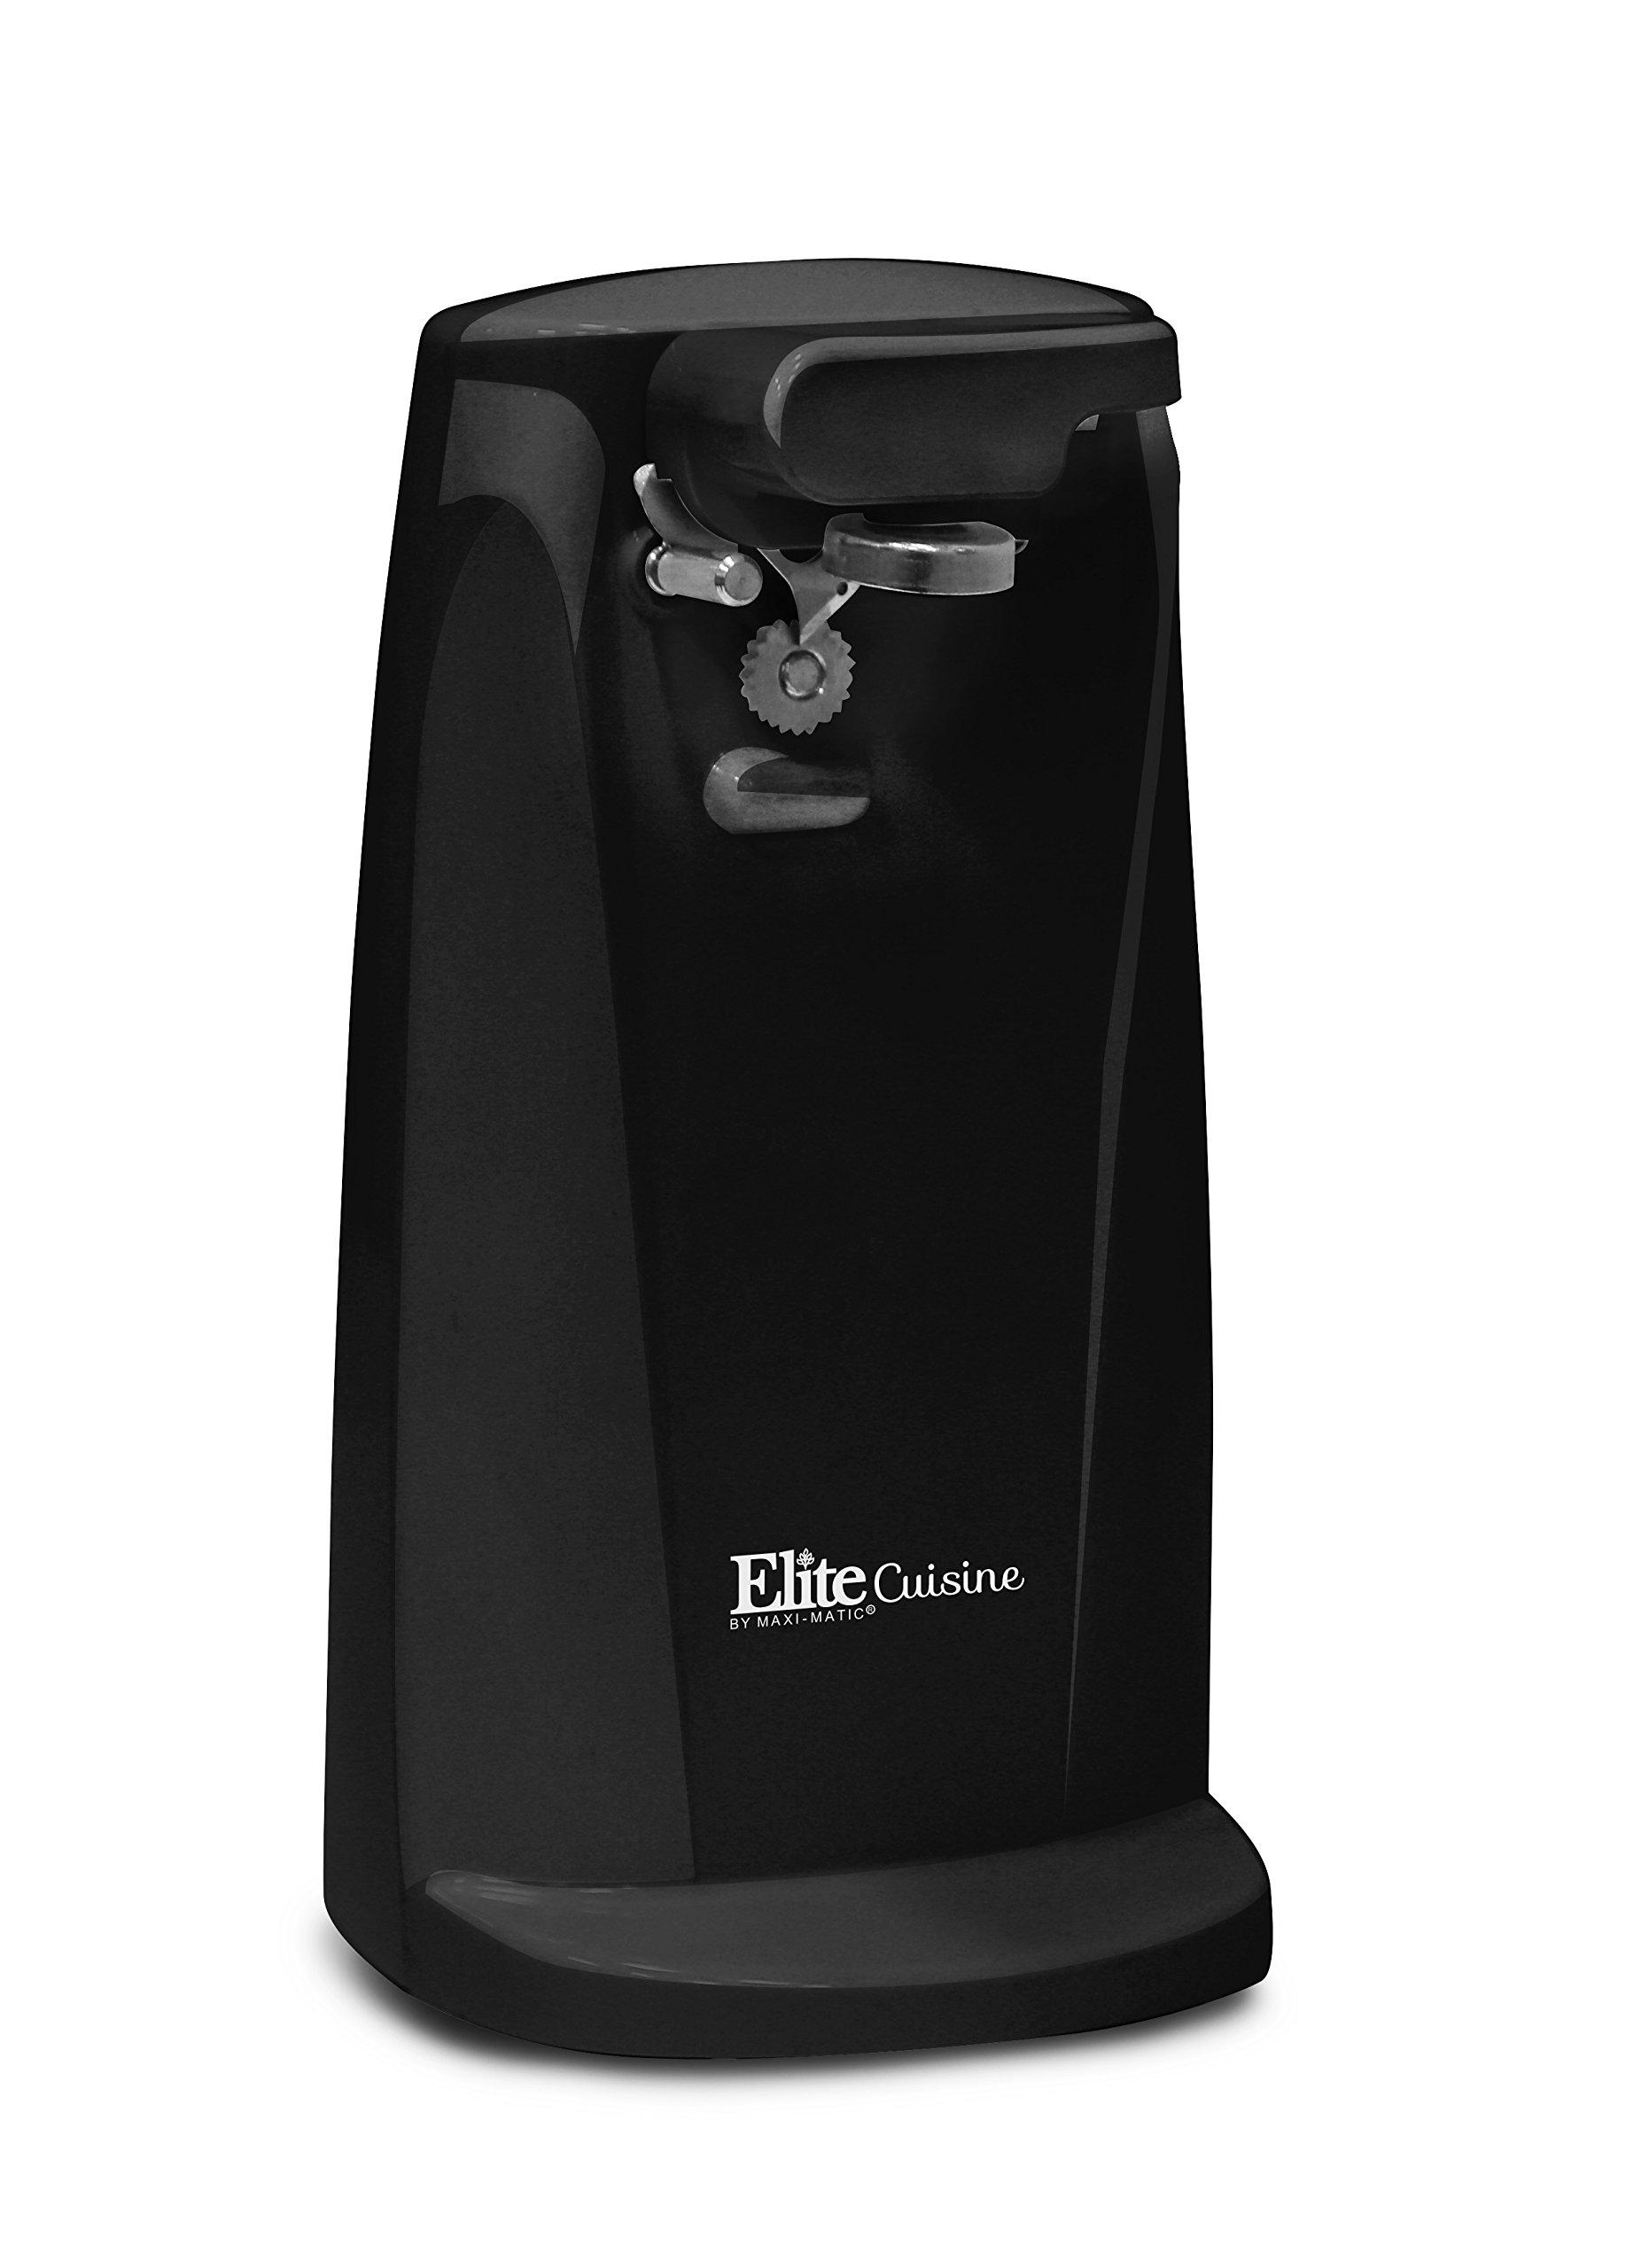 Elite Cuisine ERH-6101 Deluxe Extra Tall Can Opener, Black